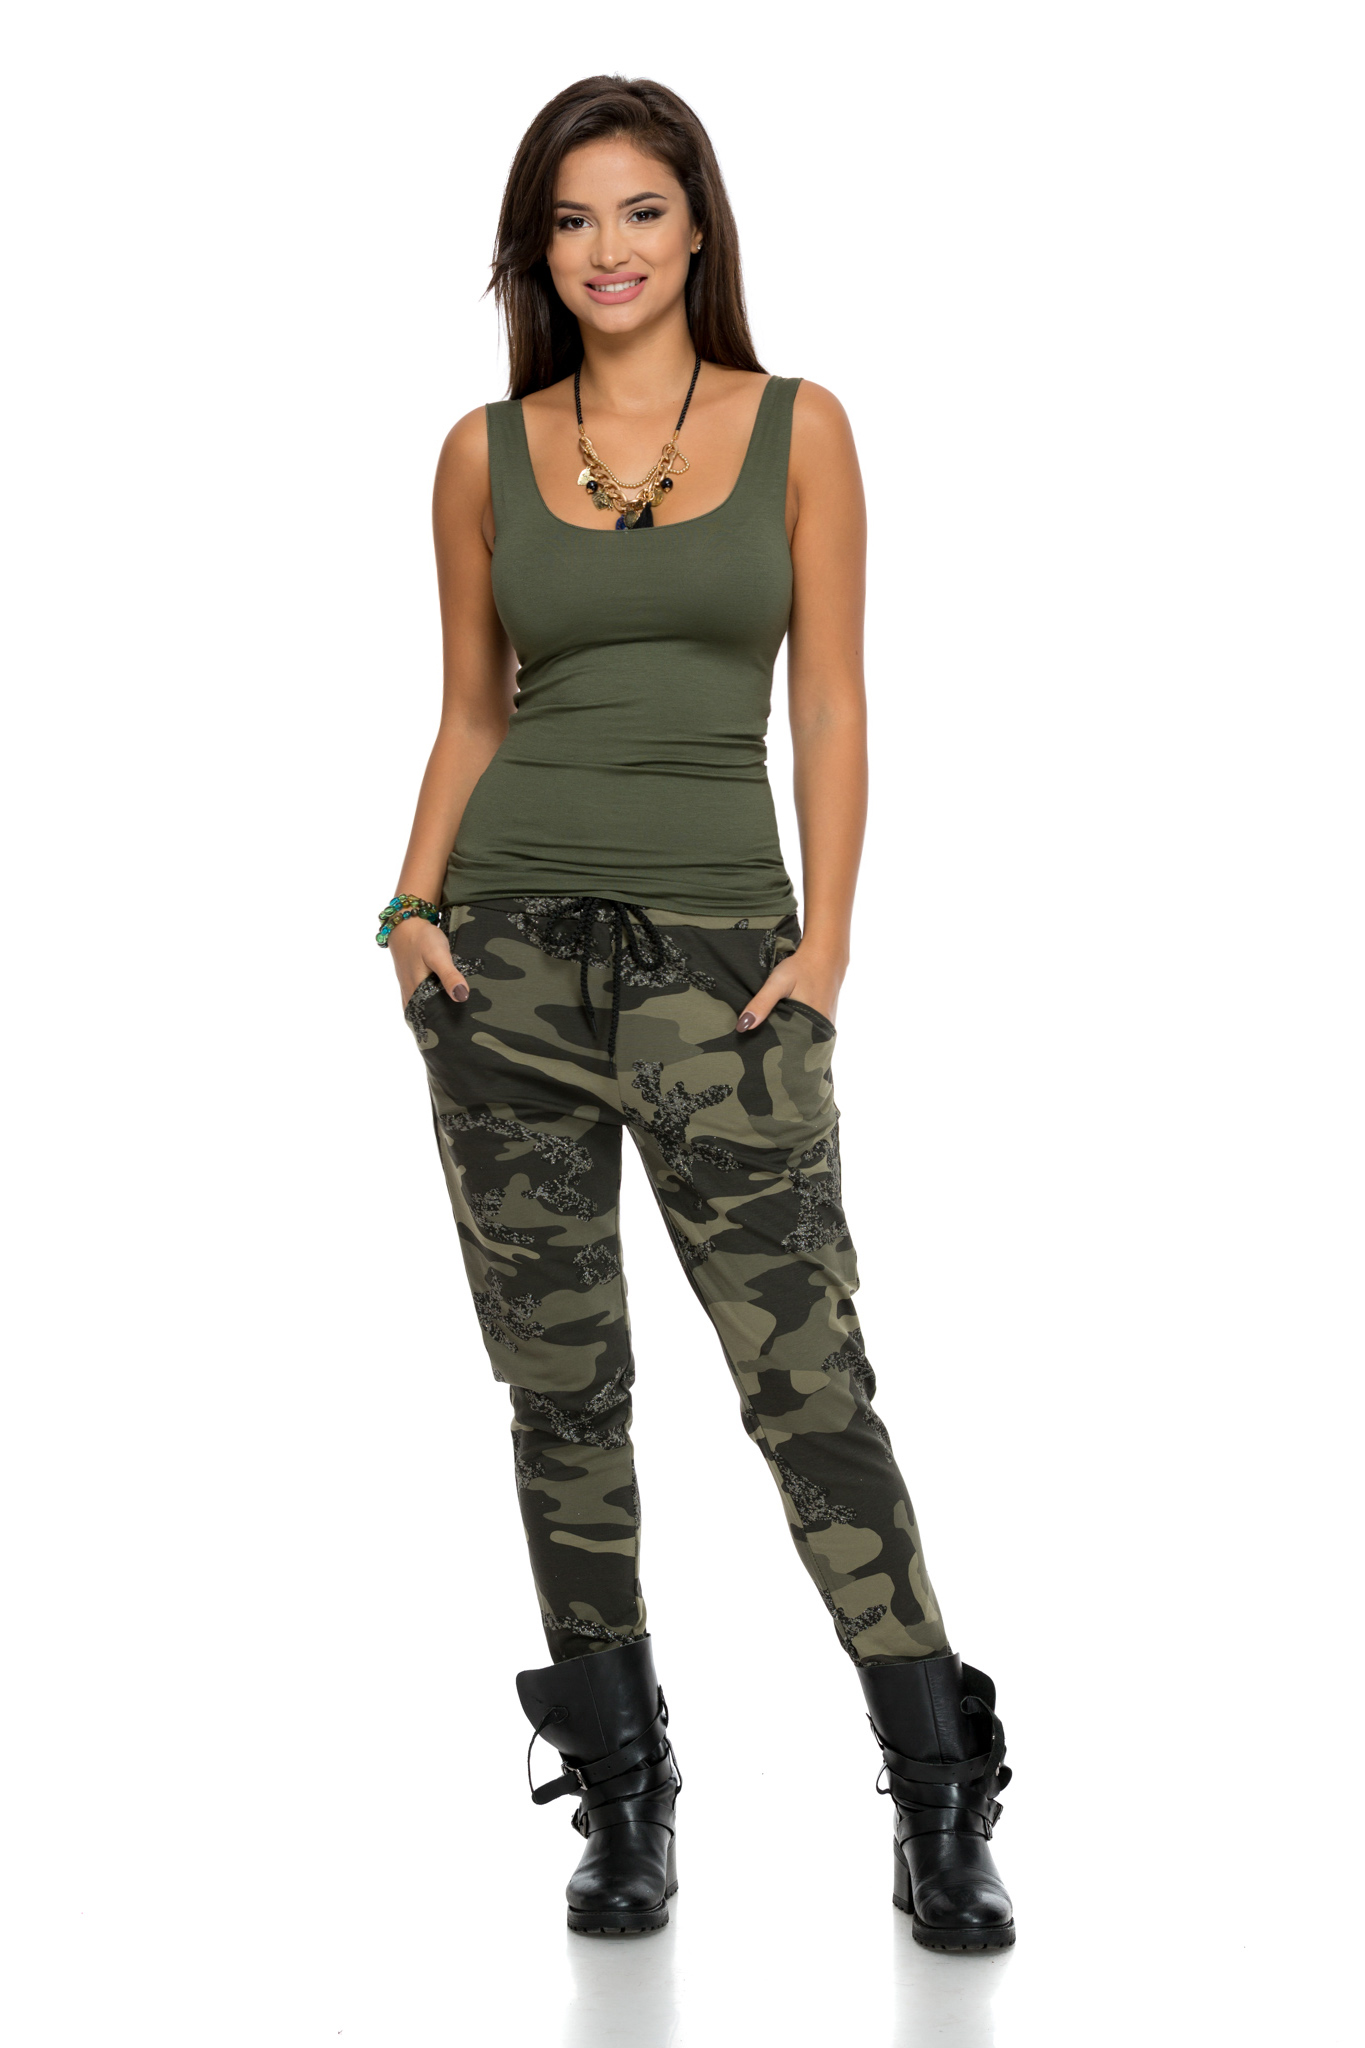 Pantaloni Unity Army